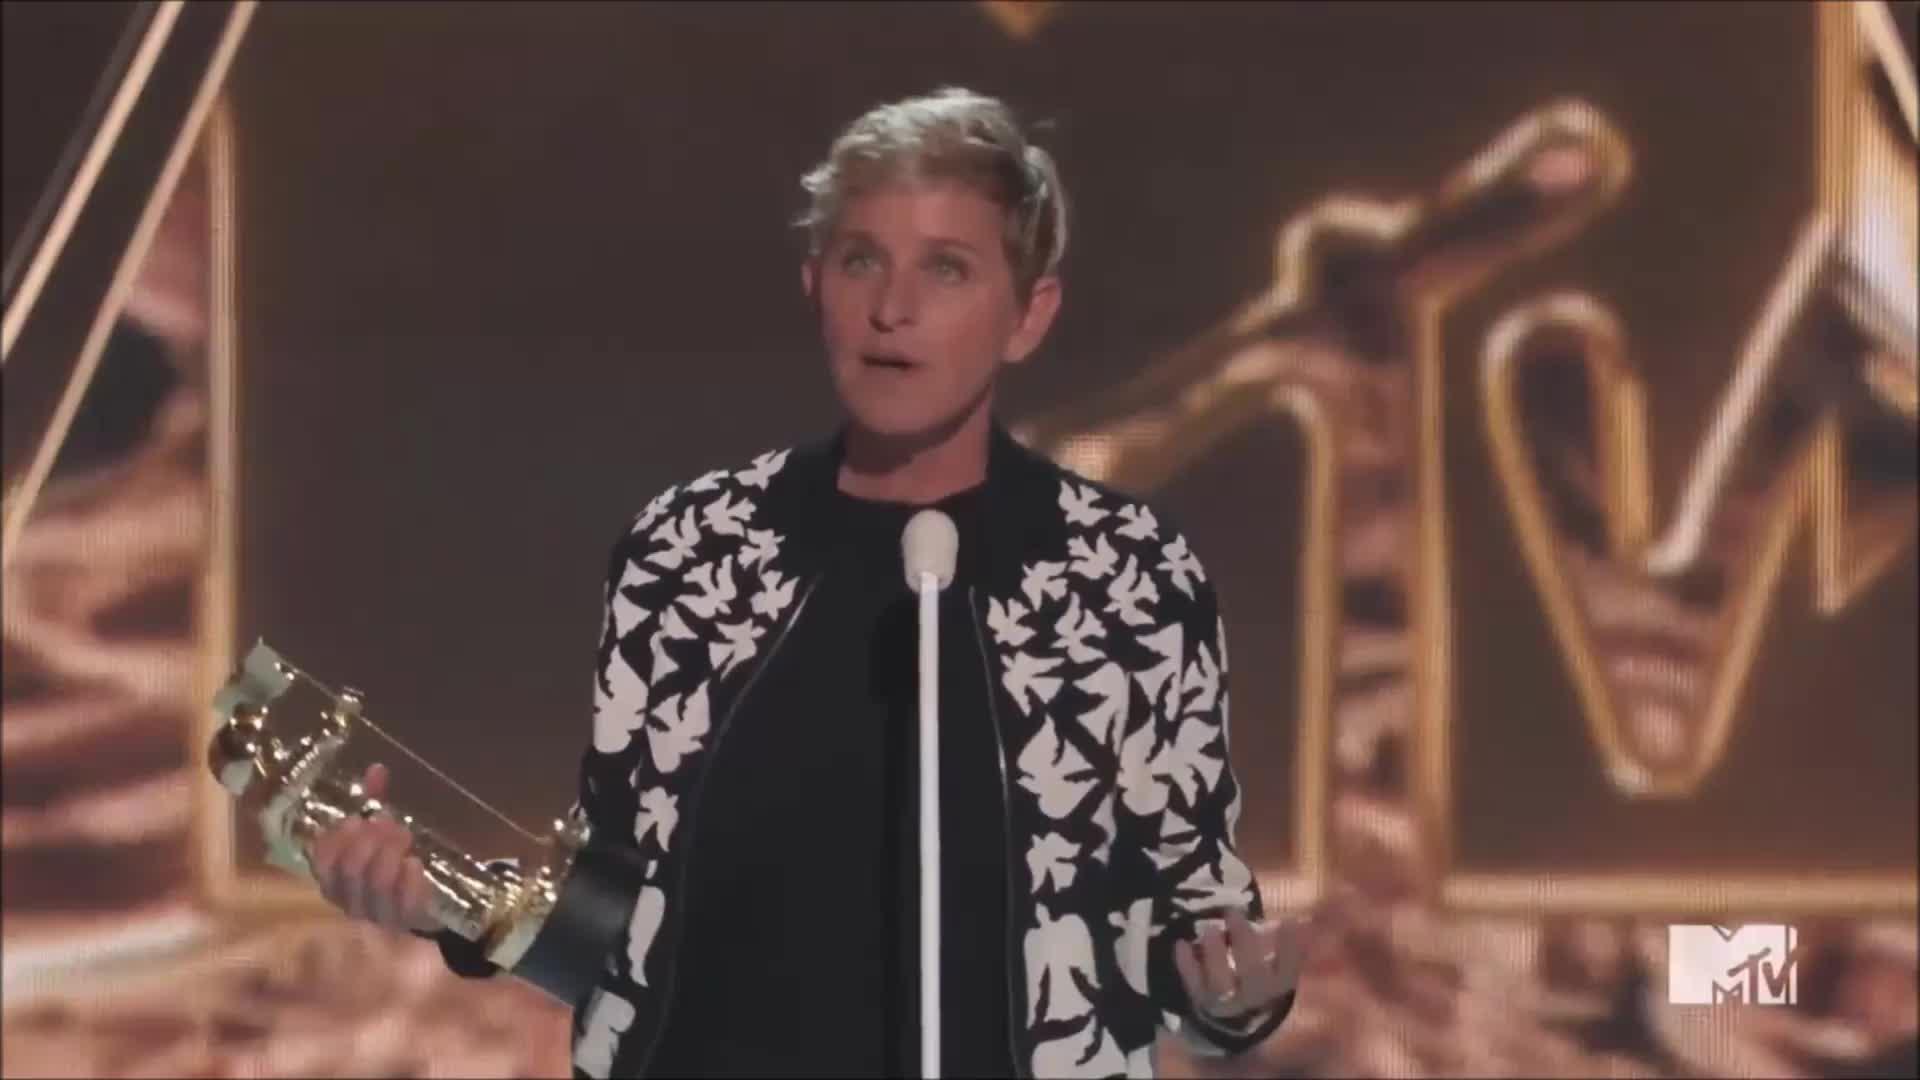 ellen degeneres, mtv, vmas, vmas2017, No biggie from Ellen DeGeneres. GIFs